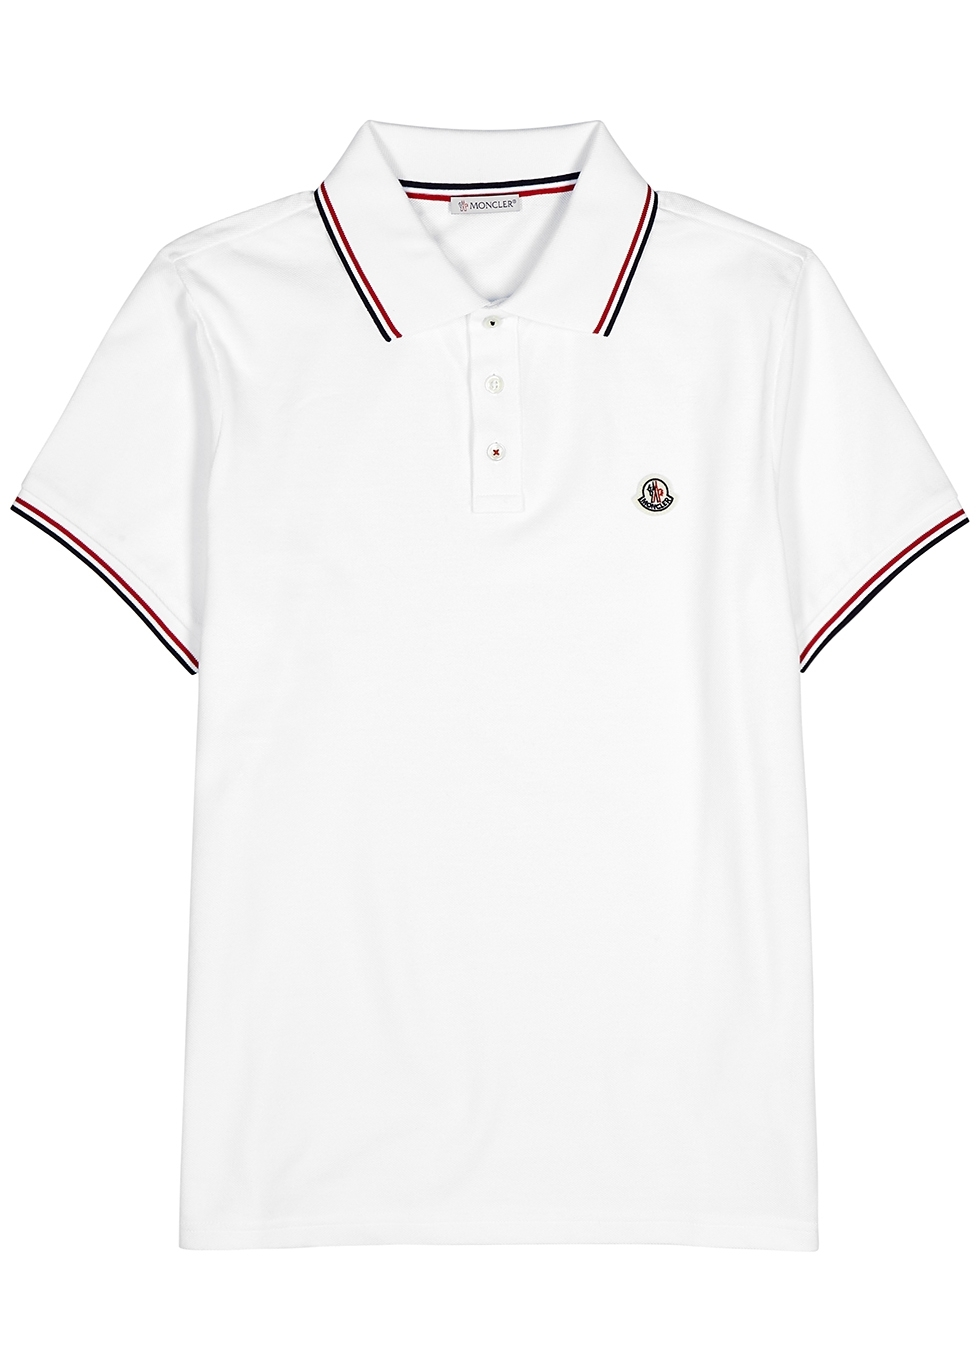 6a1701fc328a Men's Designer Polo Shirts - Polo Shirts For Men - Harvey Nichols